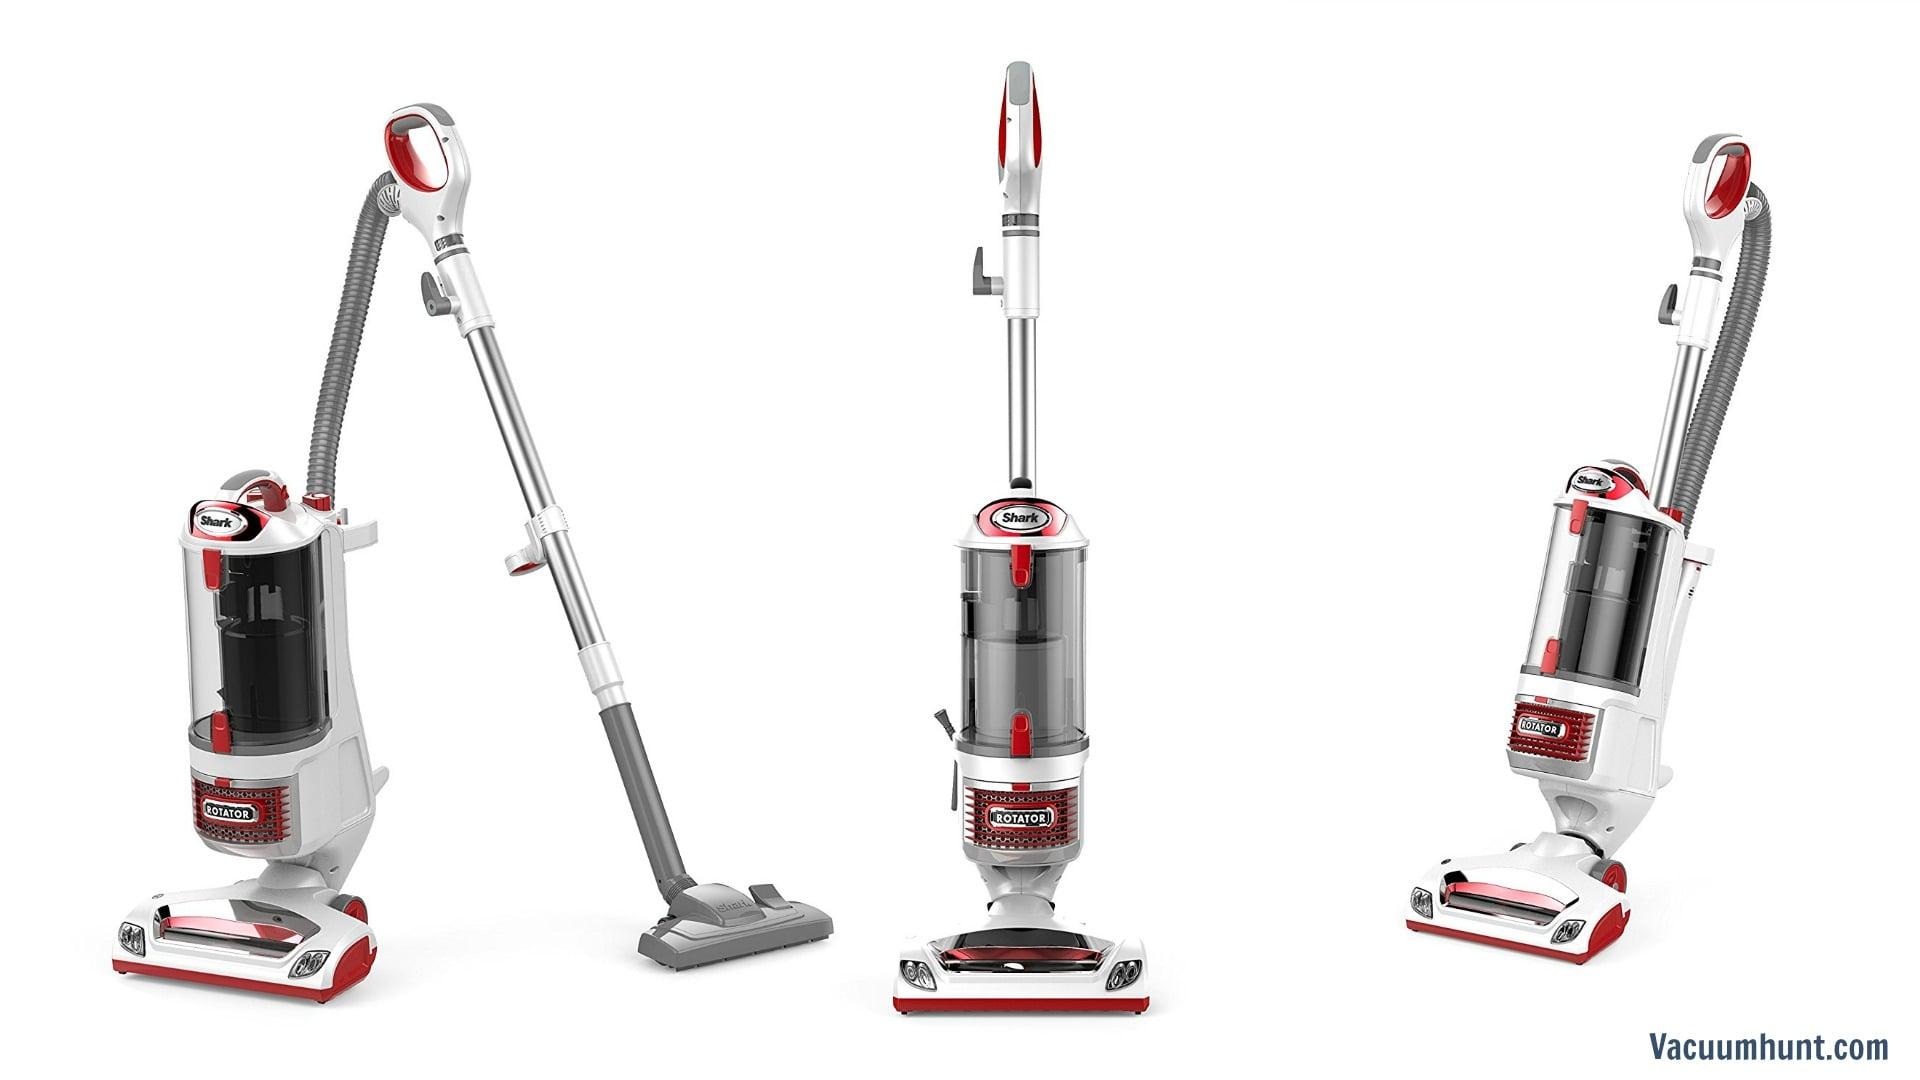 Shark Nv501 Rotator Professional Lift Away Vacuum Cleaner